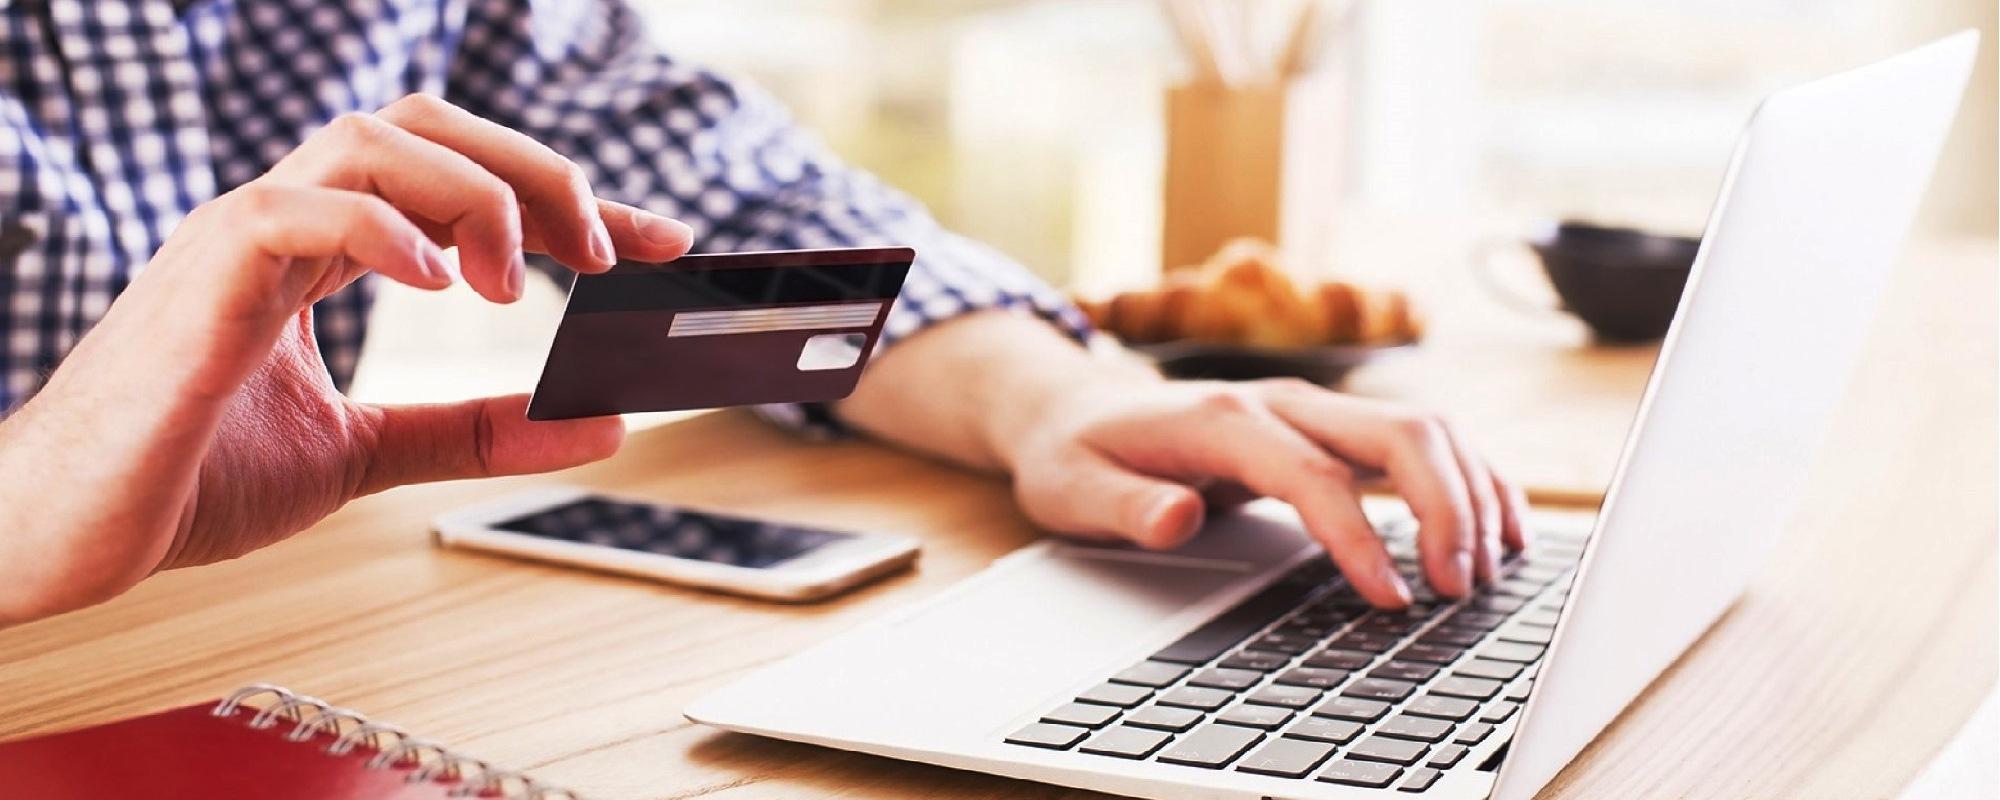 быстро займ на карту онлайн план счетов кредитных организаций характеристика разделов